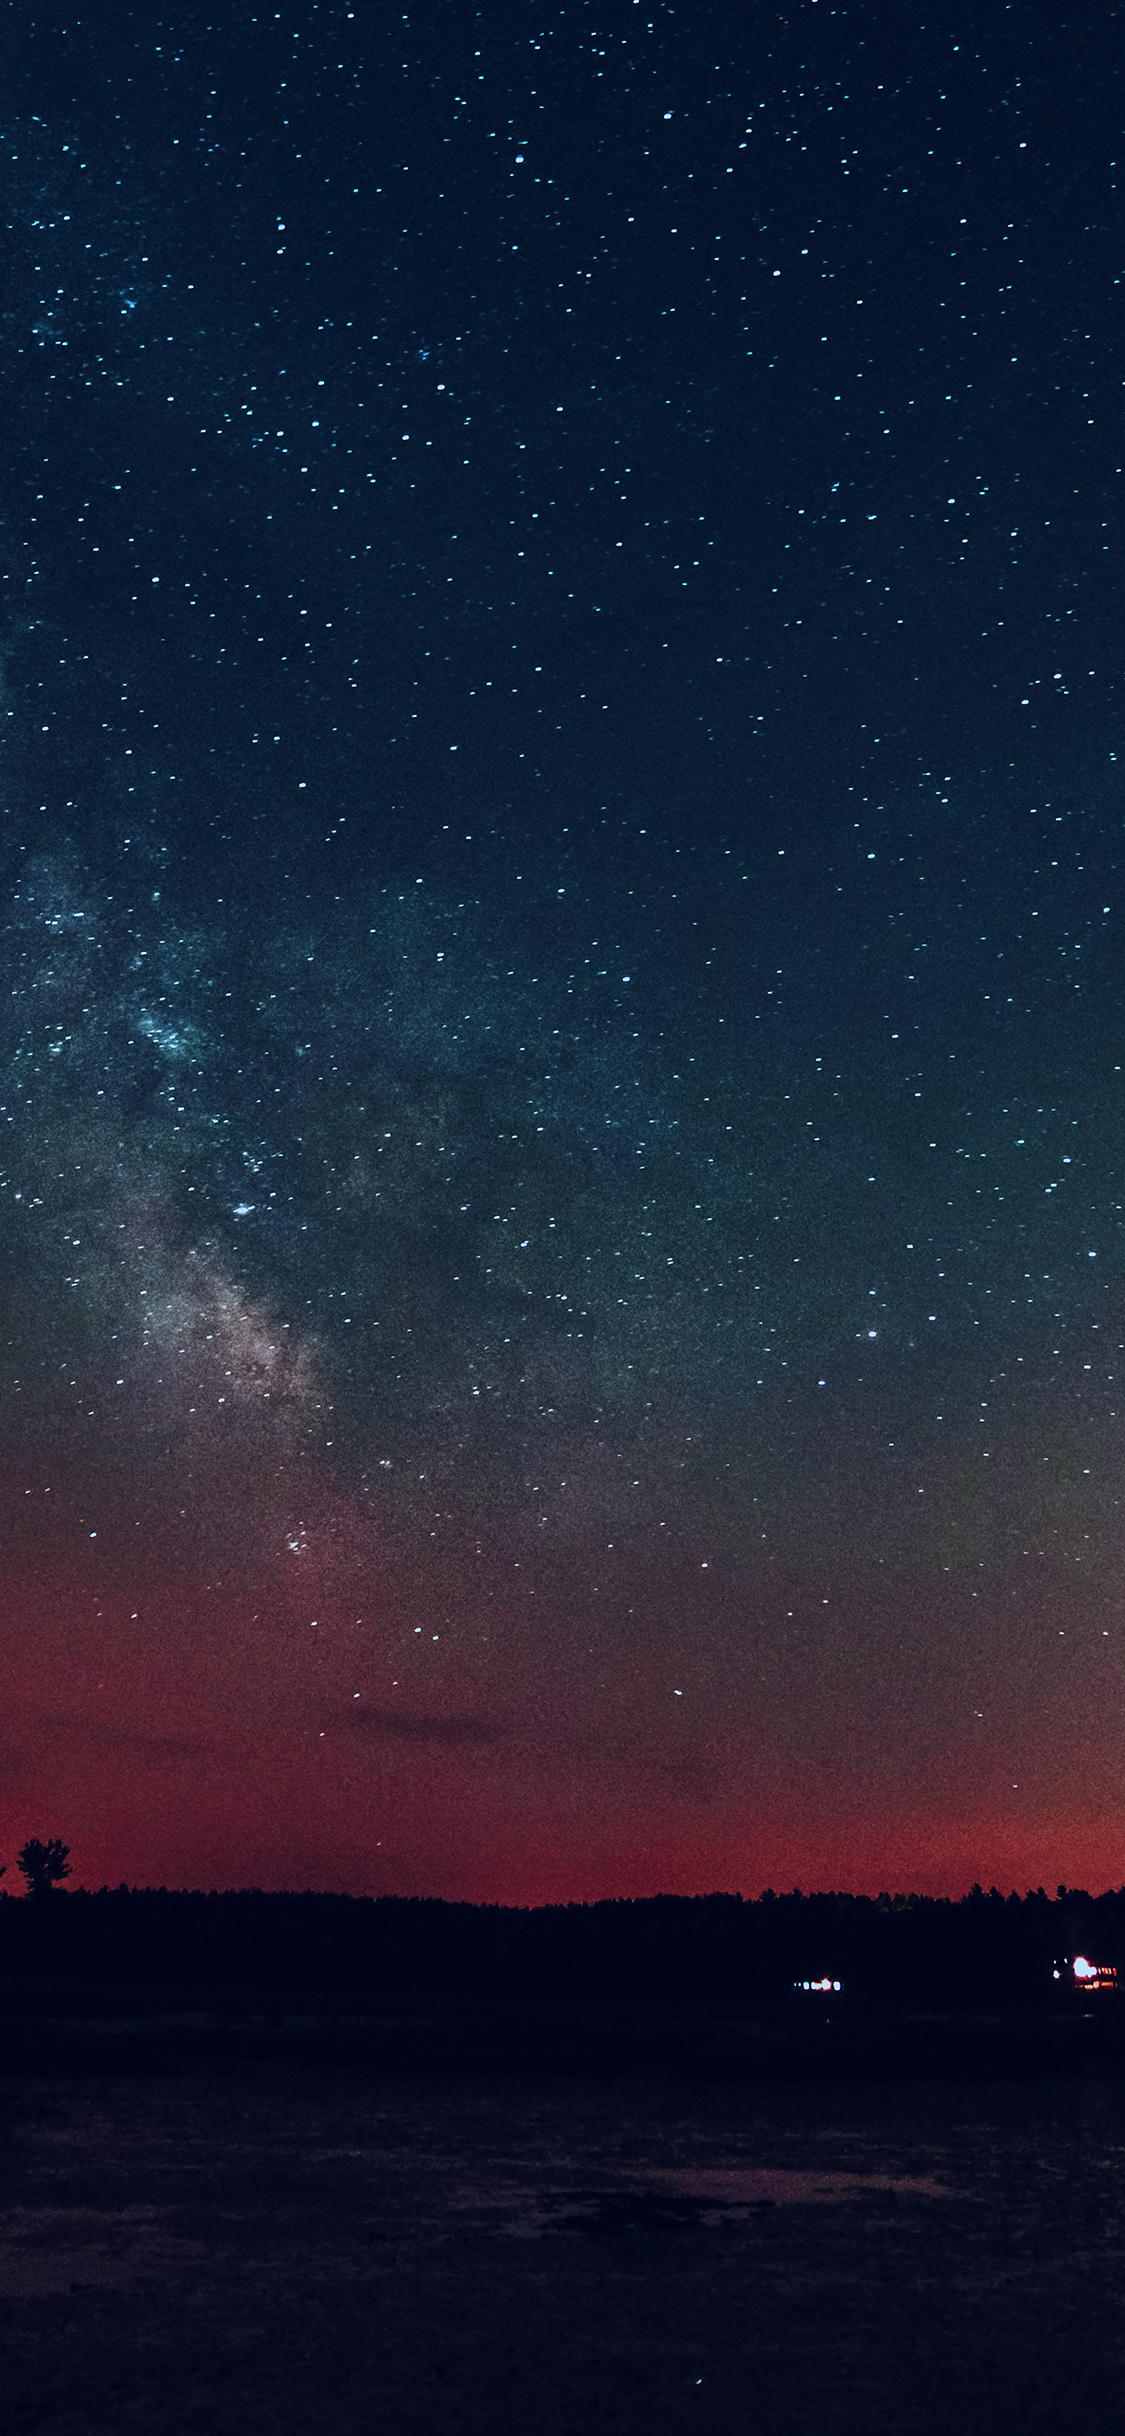 Iphonexpapers Com Iphone X Wallpaper Nk53 Night Sky Star